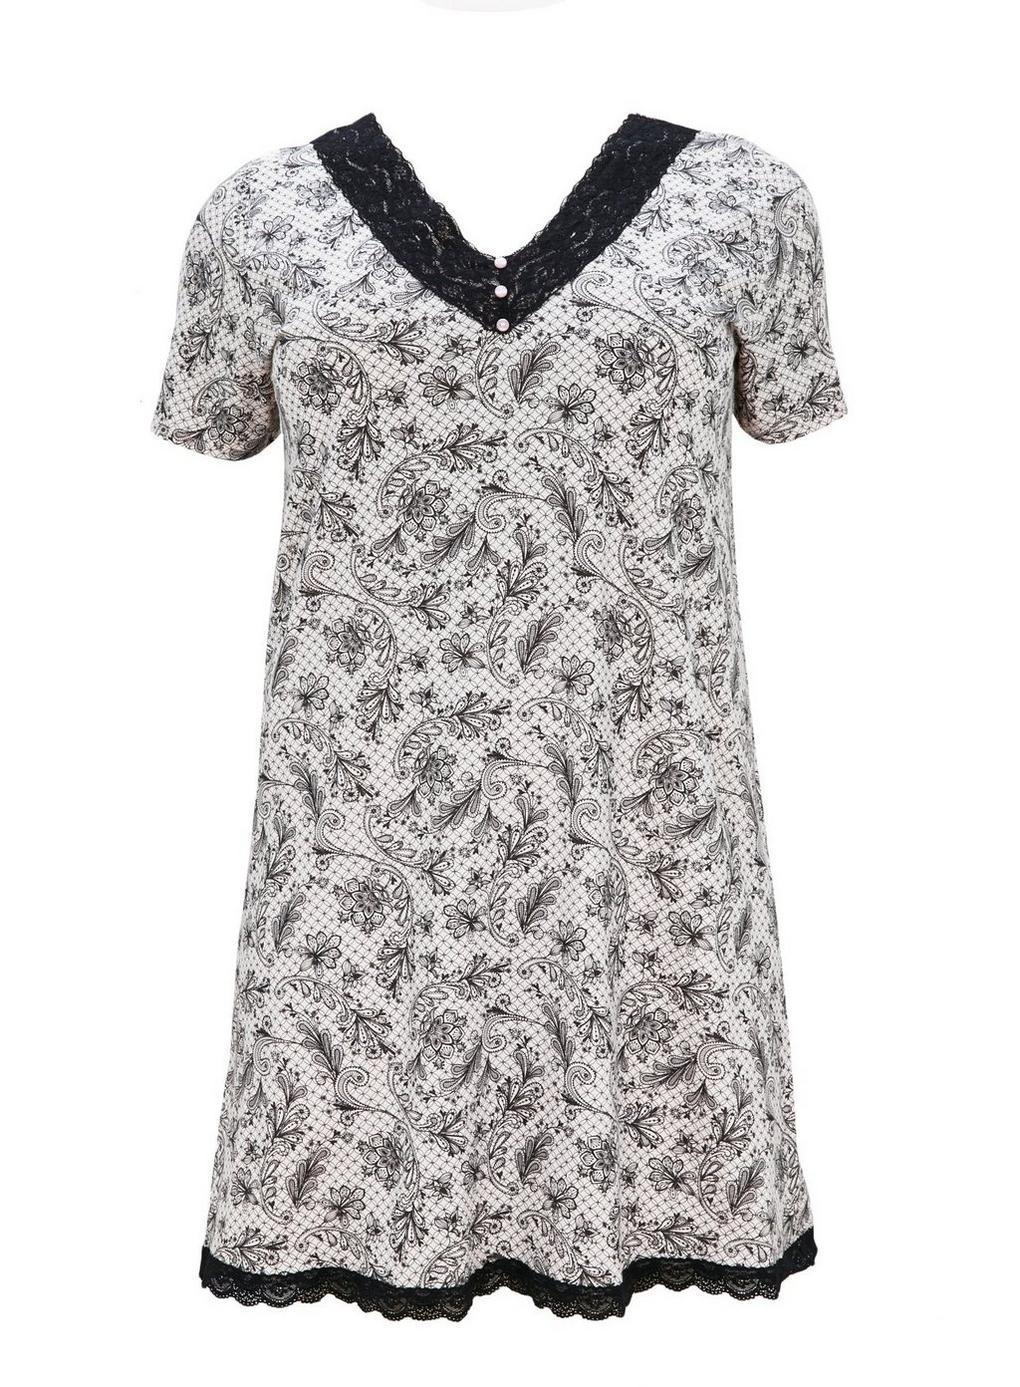 77899c7230 Evans Black Lace Printed Nightdress in Black - Lyst